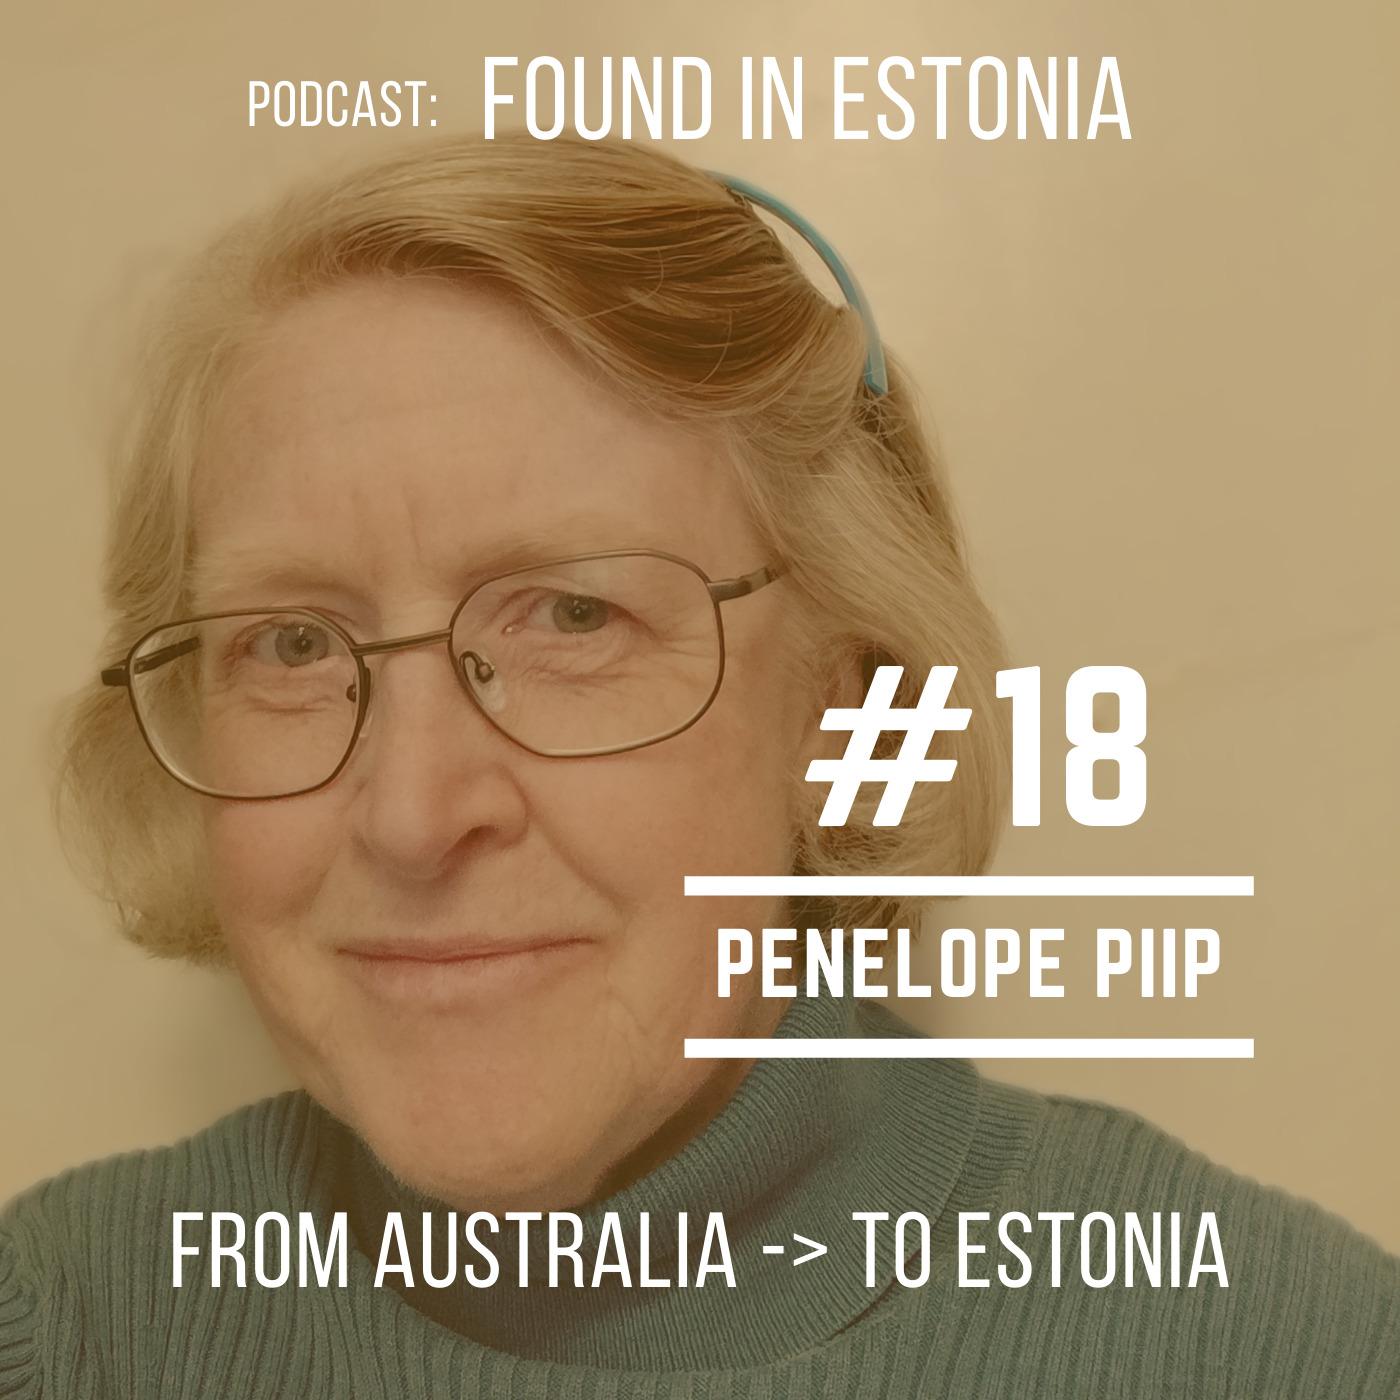 #18 Penelope Piip from Australia to Estonia